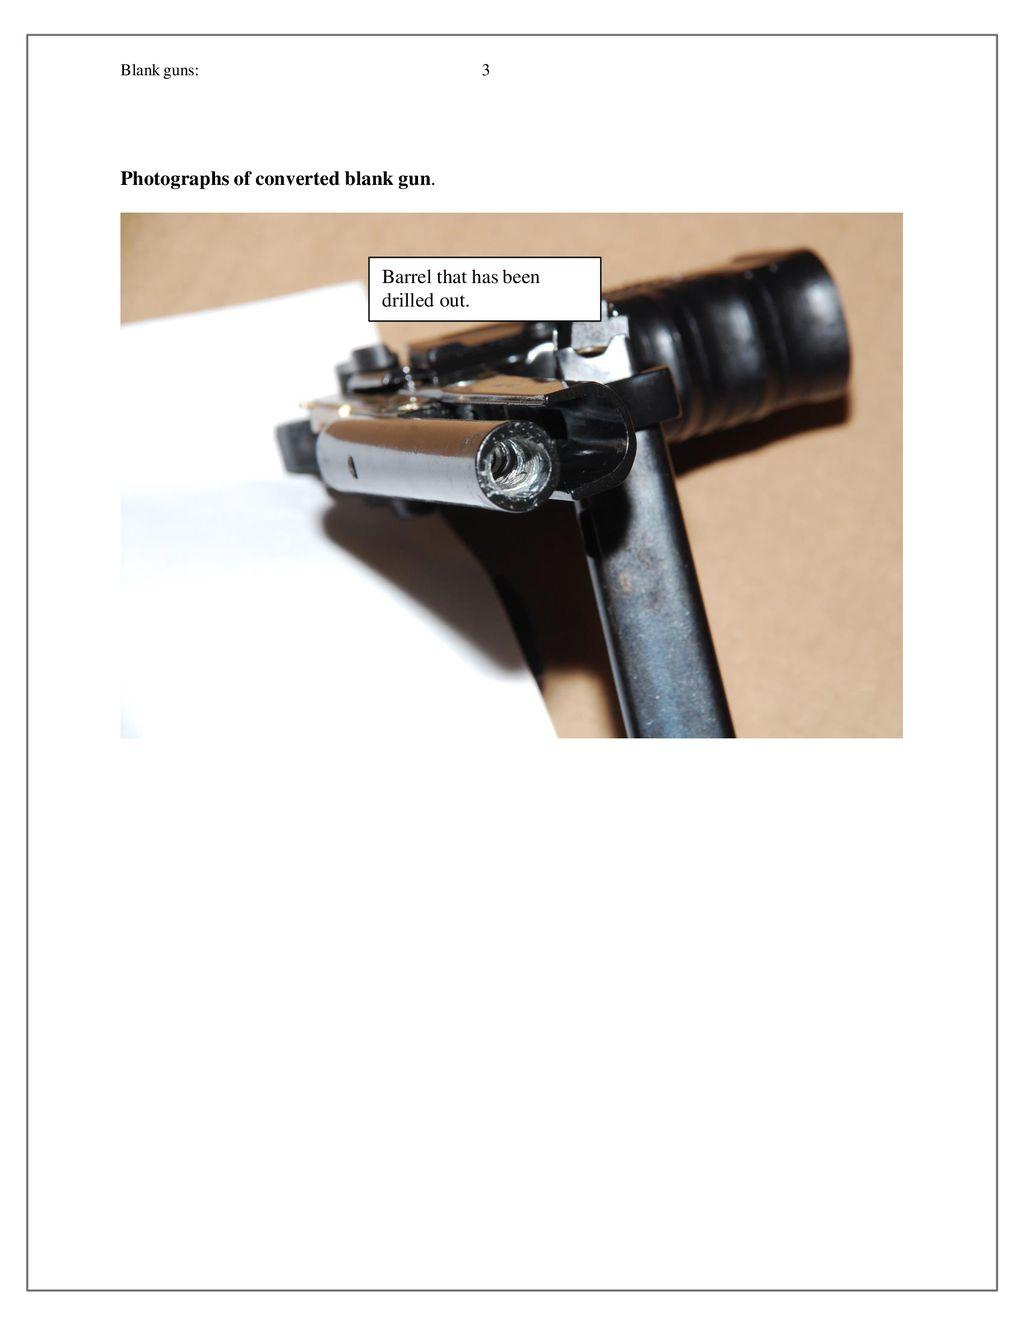 Rick Vasquez Firearms LLC Proliferation of Blank Guns that